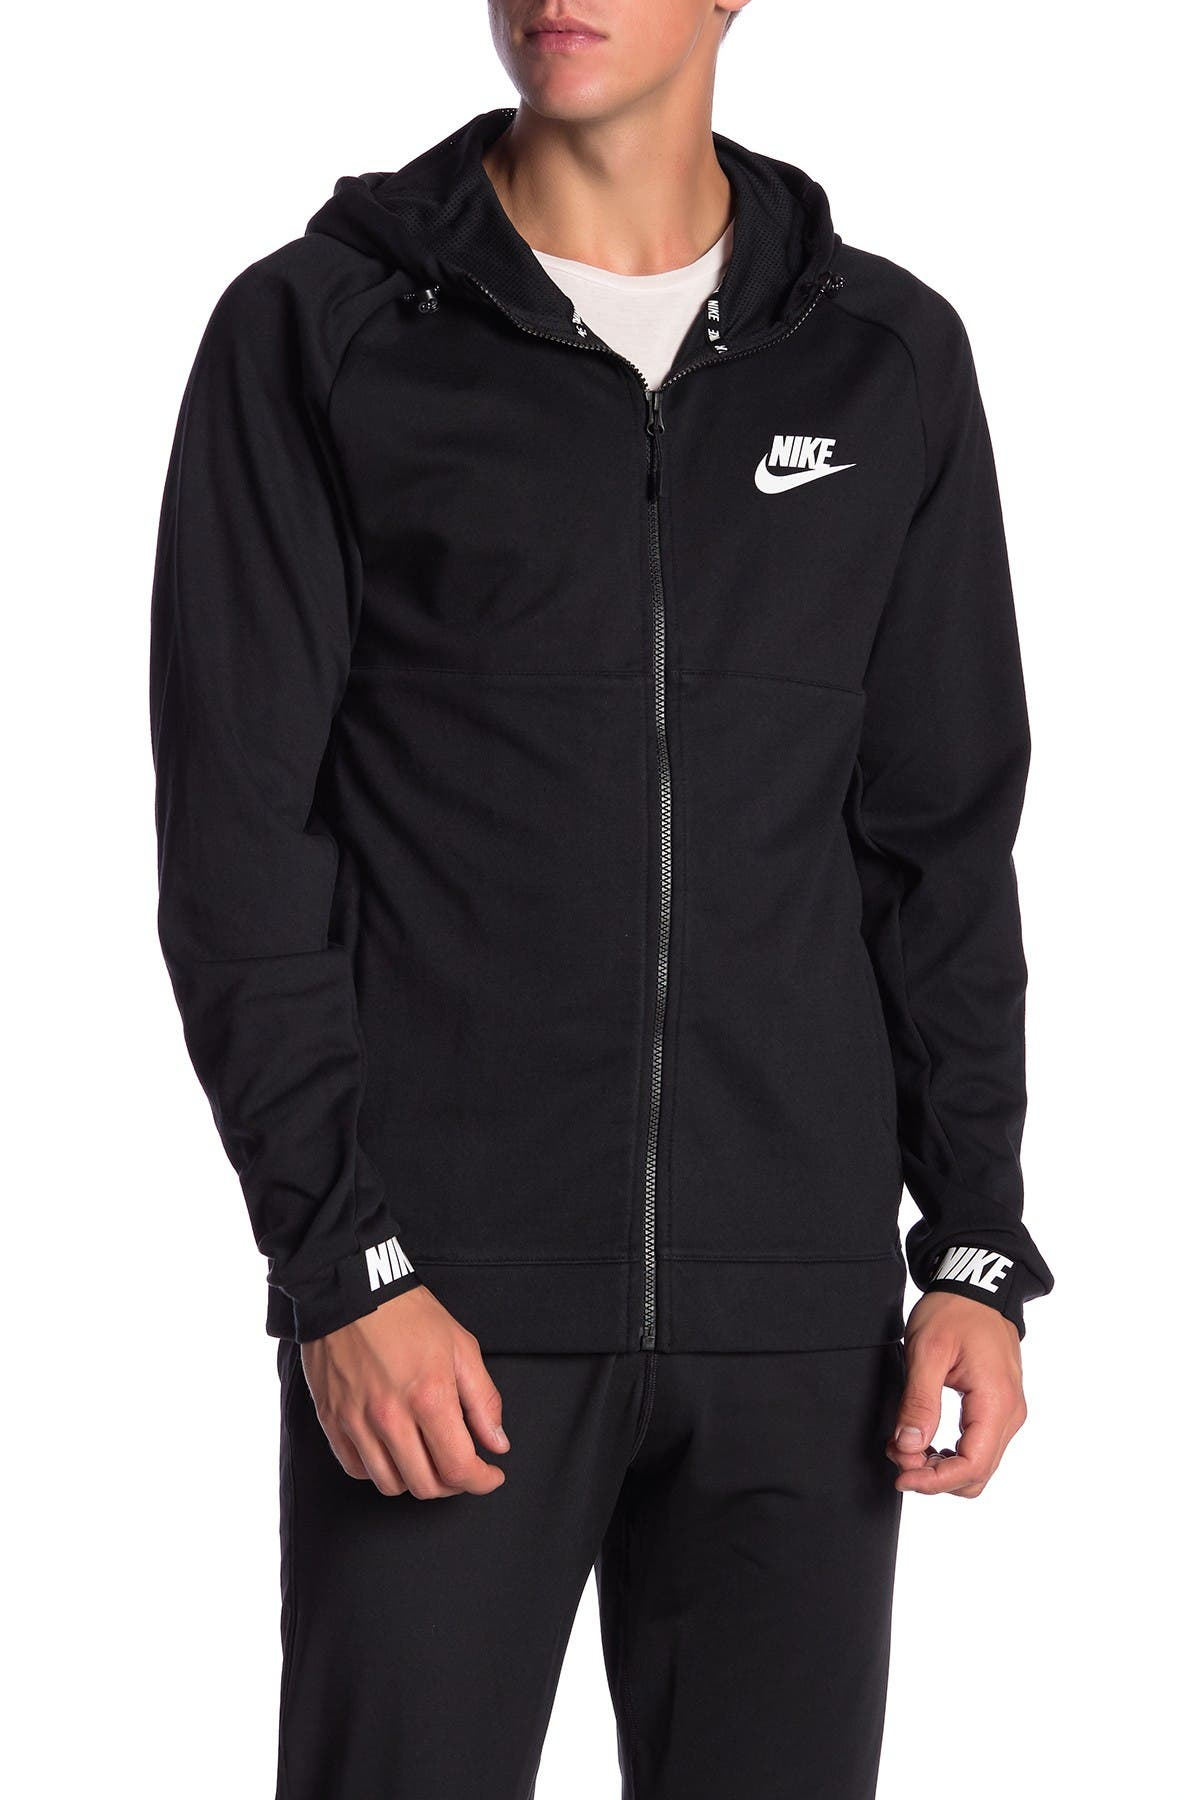 niebla Cantidad de corriente  Nike | AV15 Fleece Hoodie | Nordstrom Rack